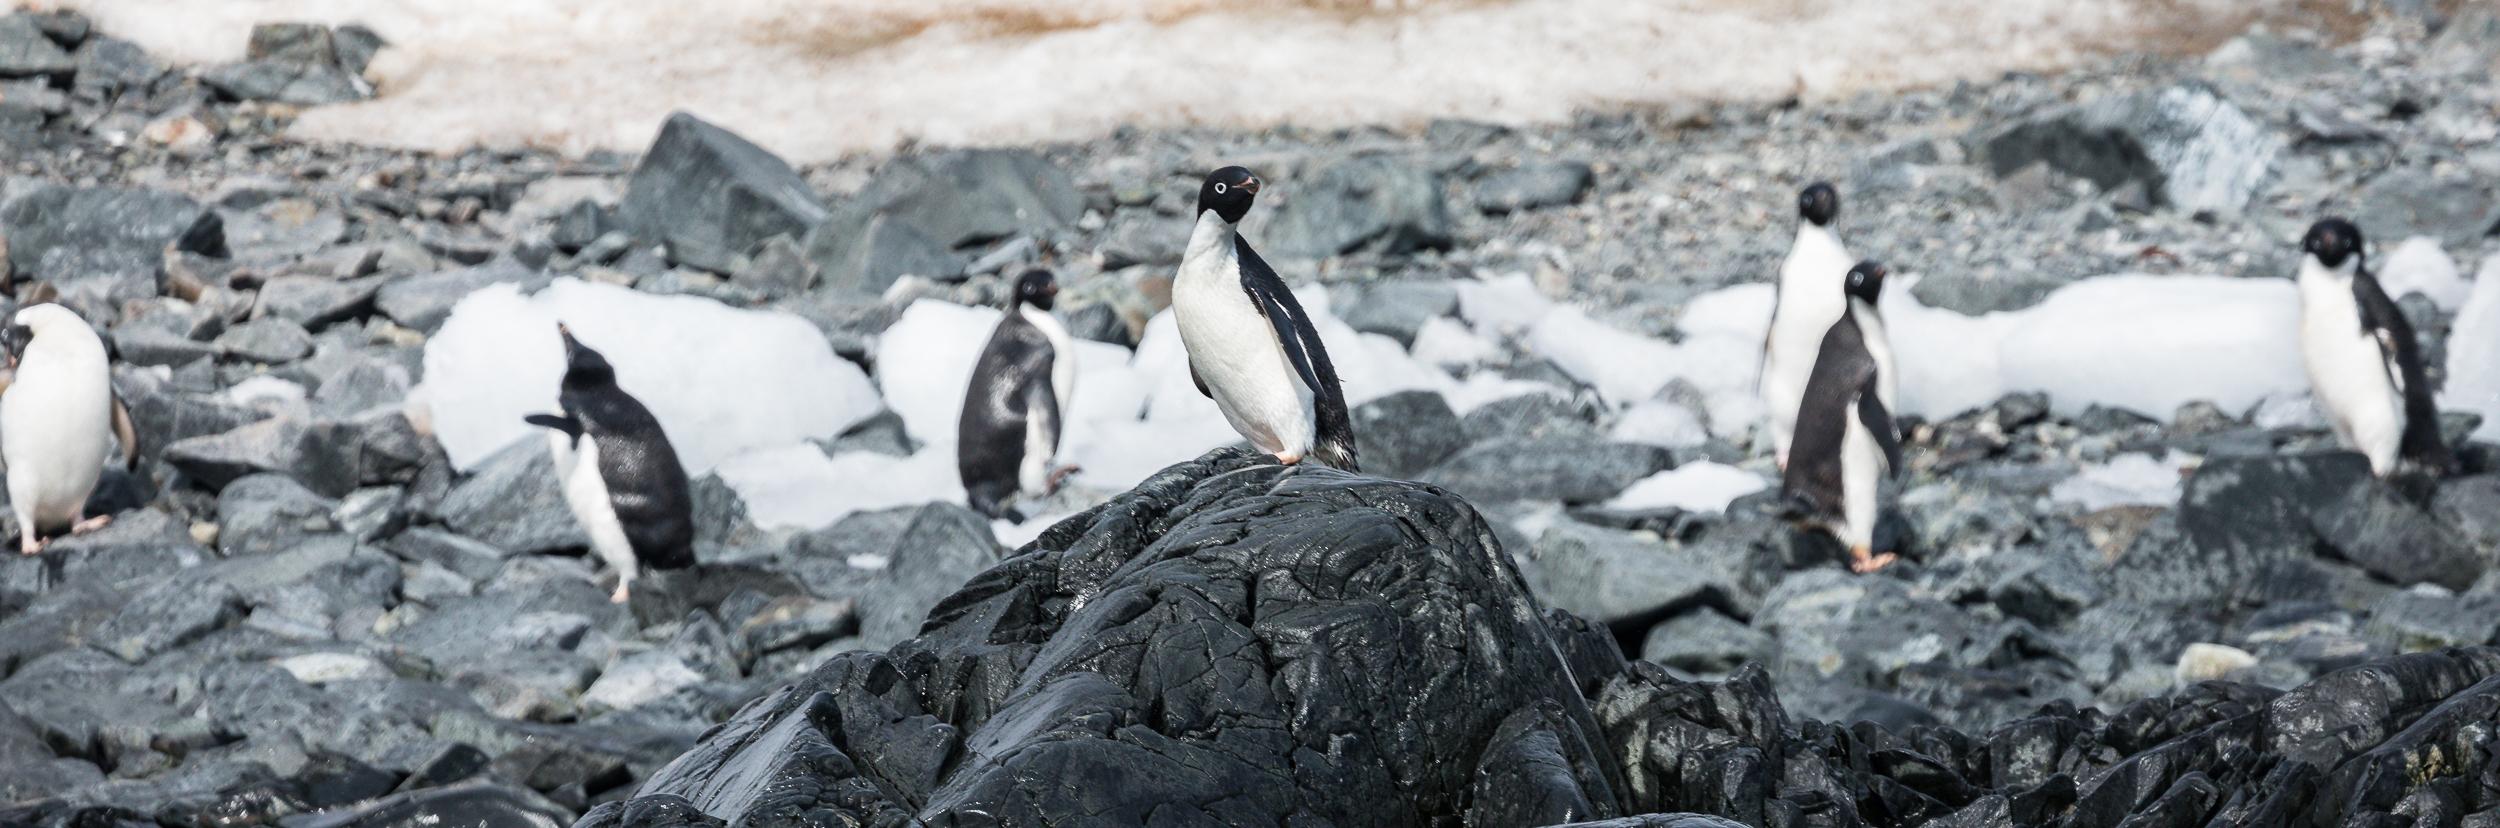 Torgerson Island, Antarctica-Brian Doyle Photo (4).jpg